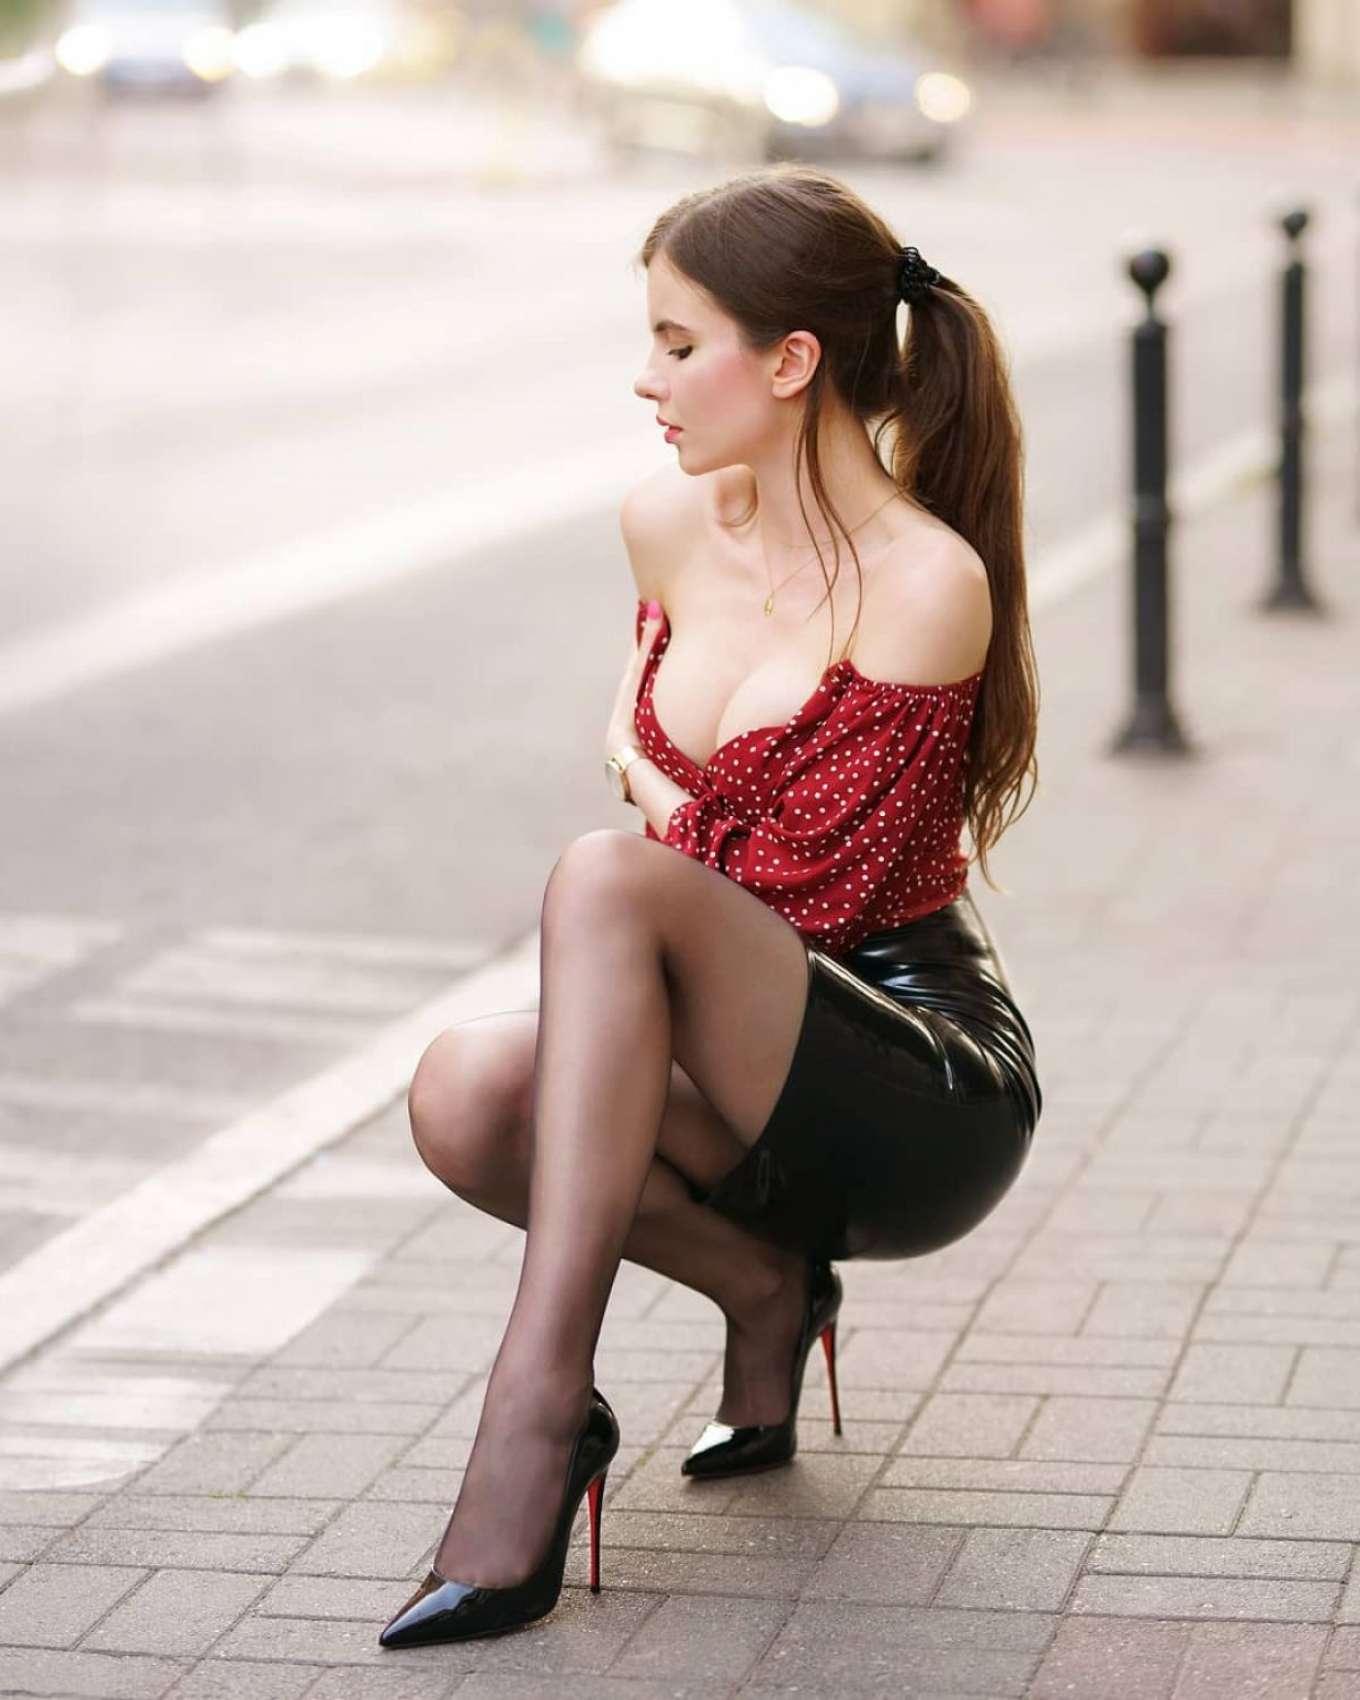 Ariadna Majewska - Photoshoot (June 2019)